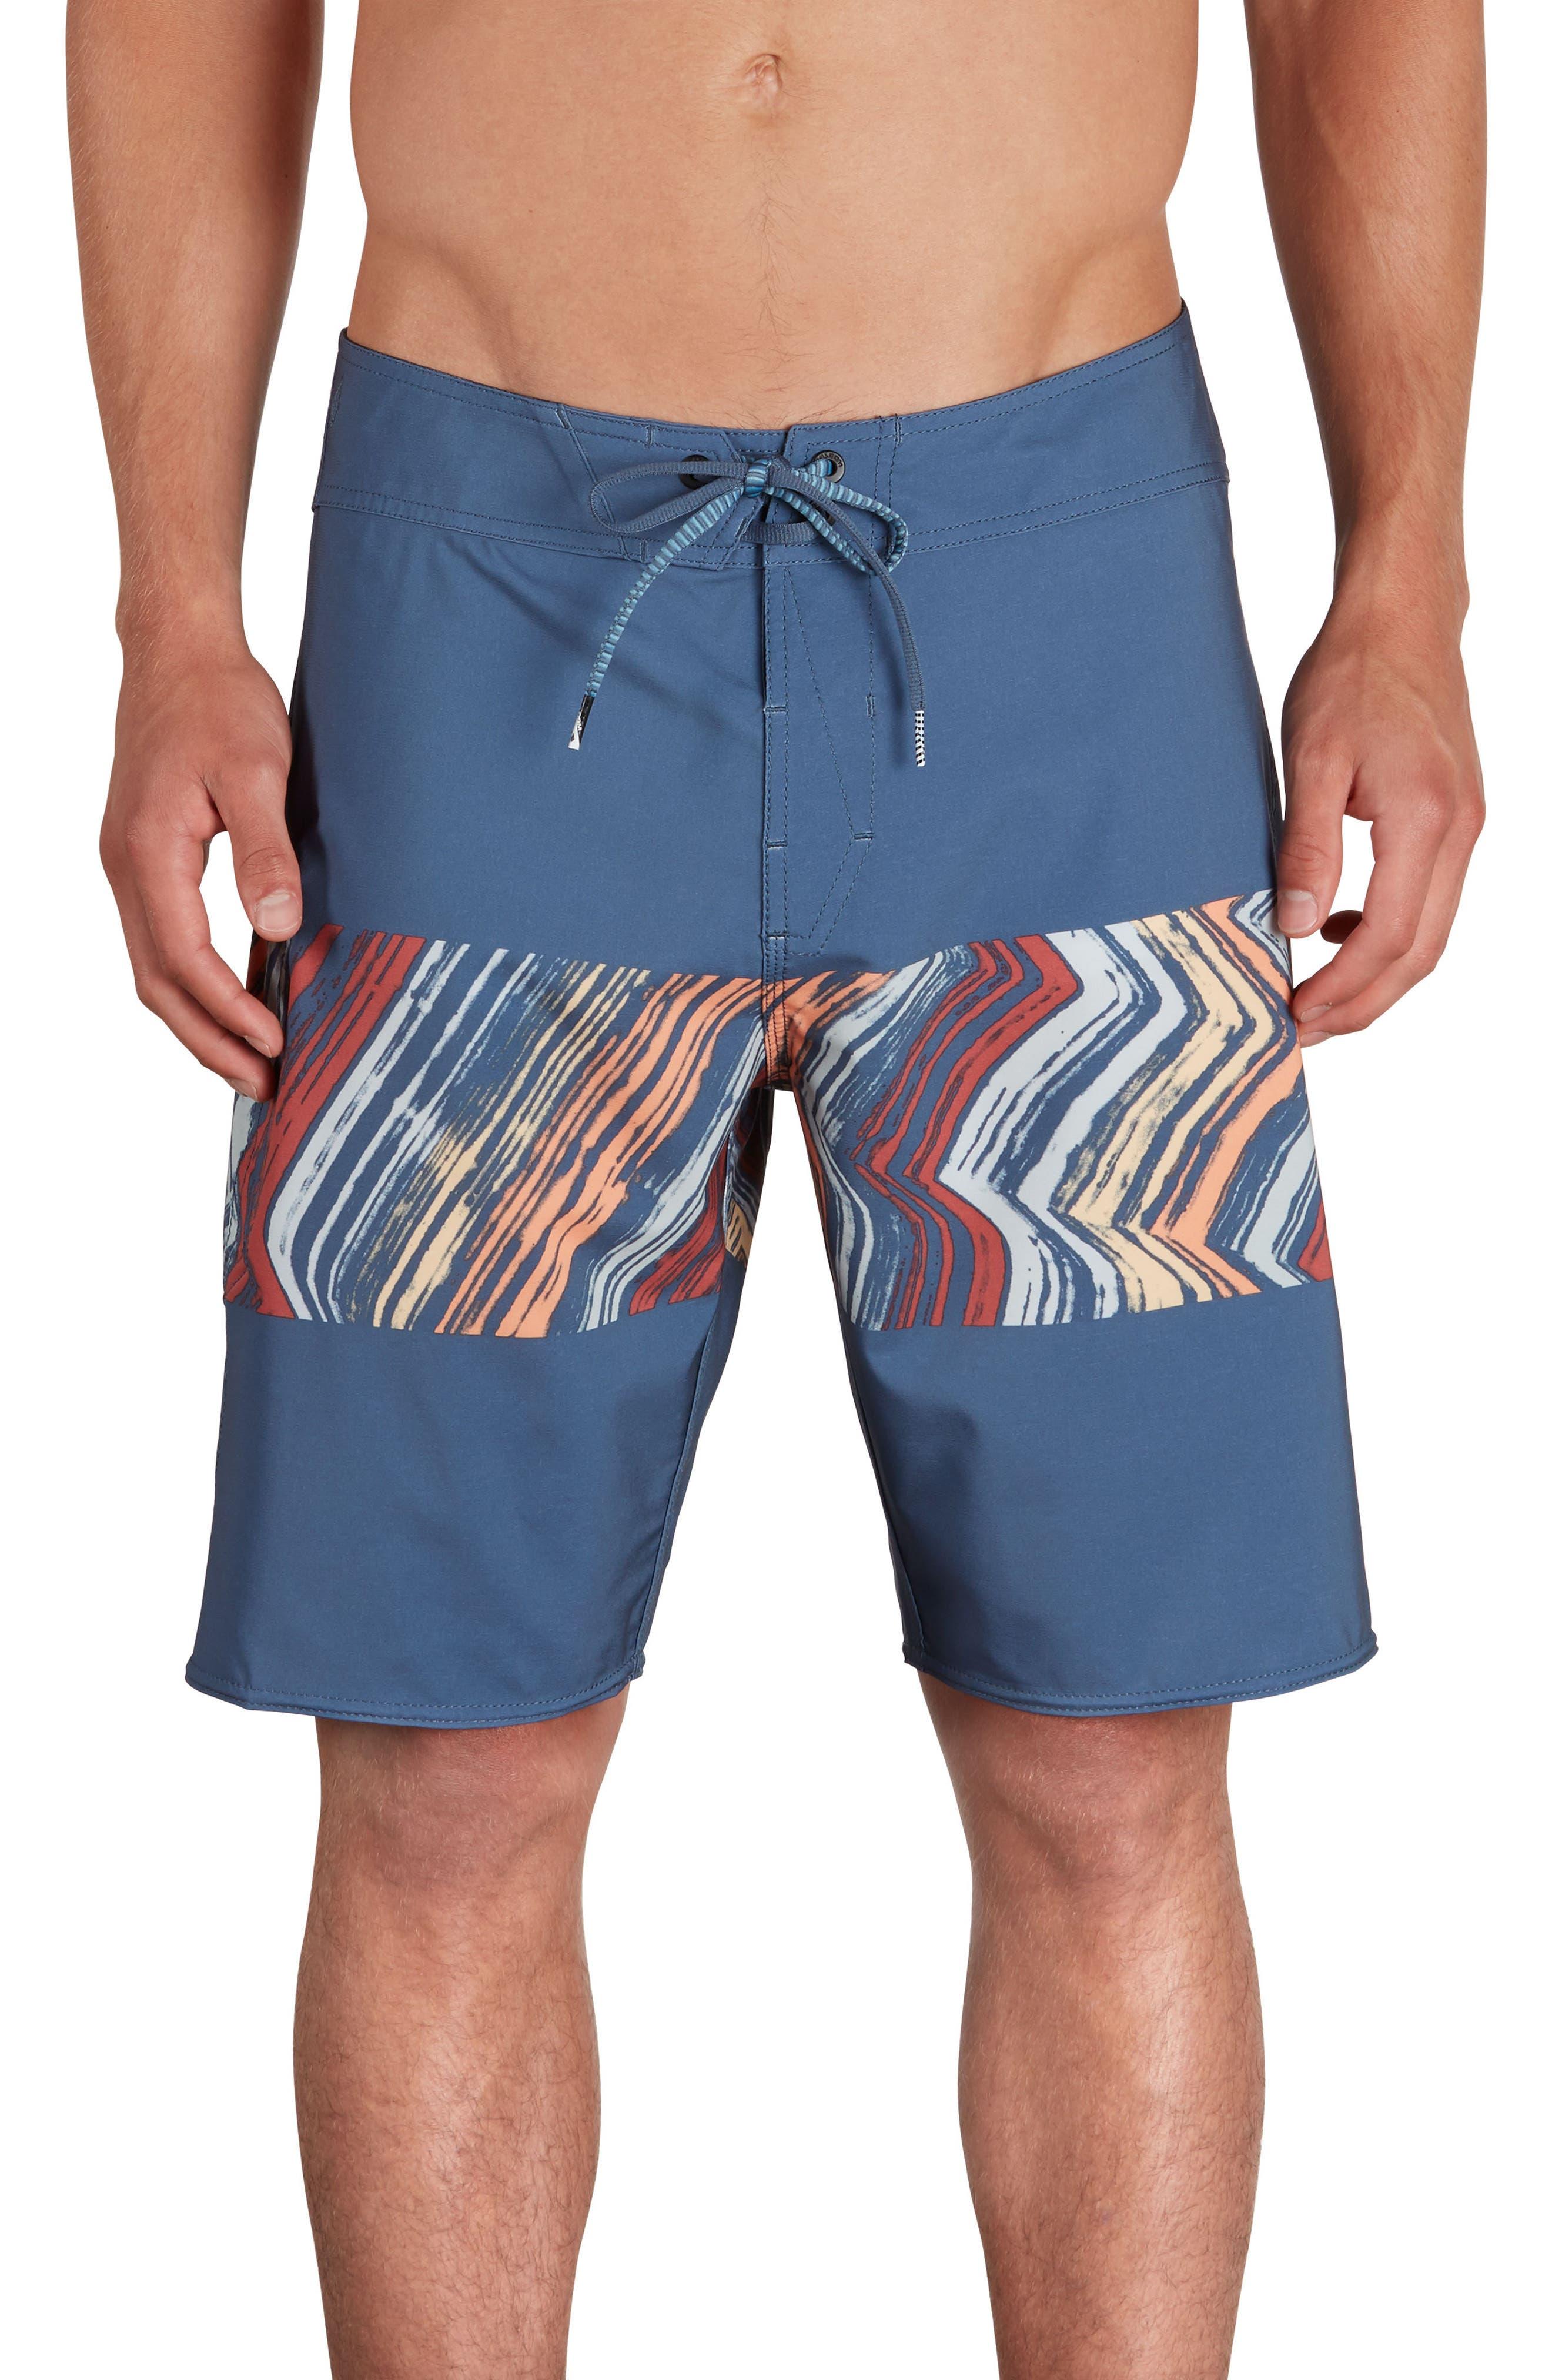 Macaw Mod Board Shorts,                             Main thumbnail 1, color,                             Sunburst